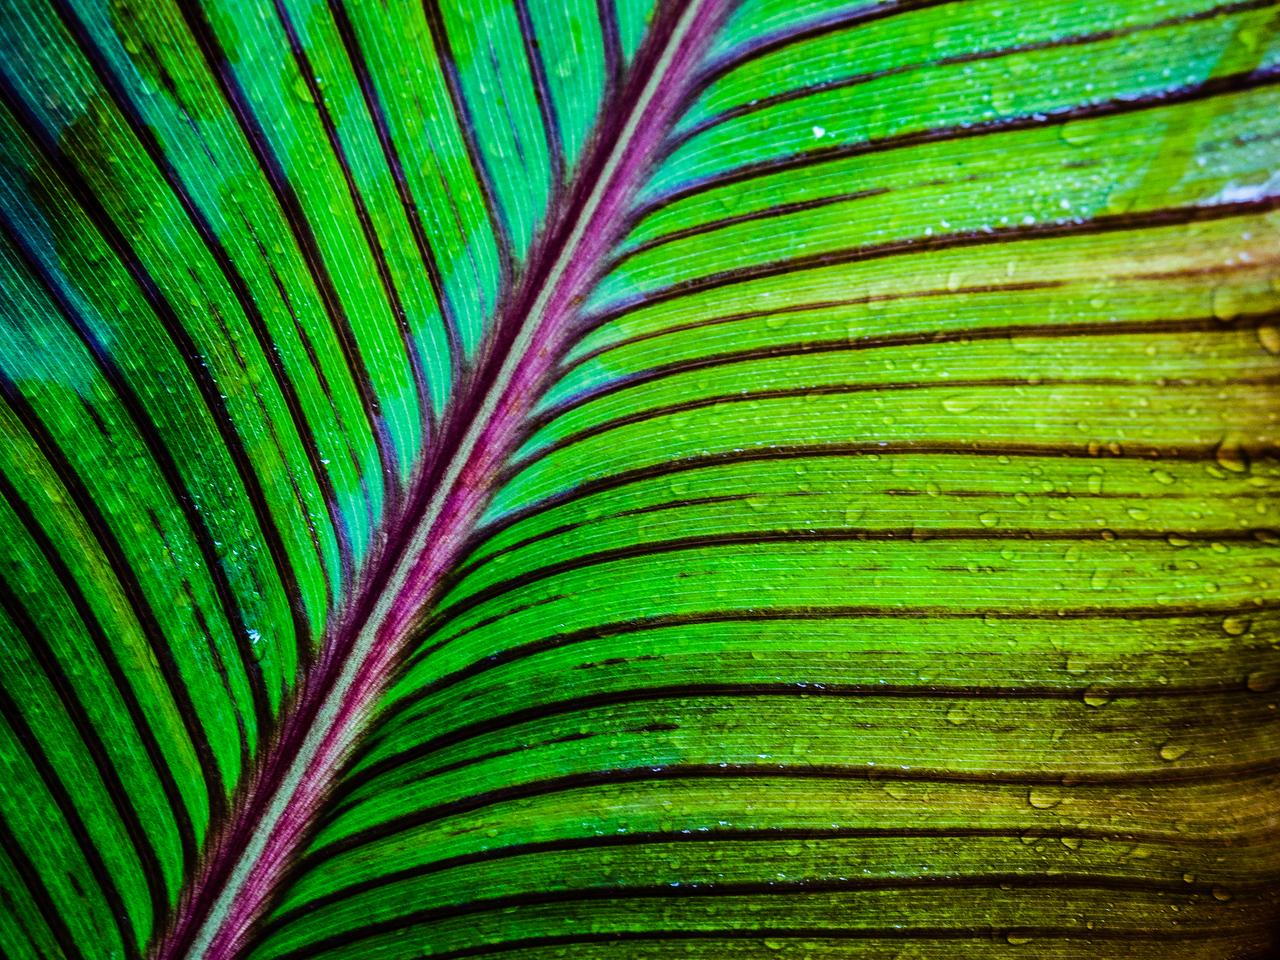 Canna Lily Leaf